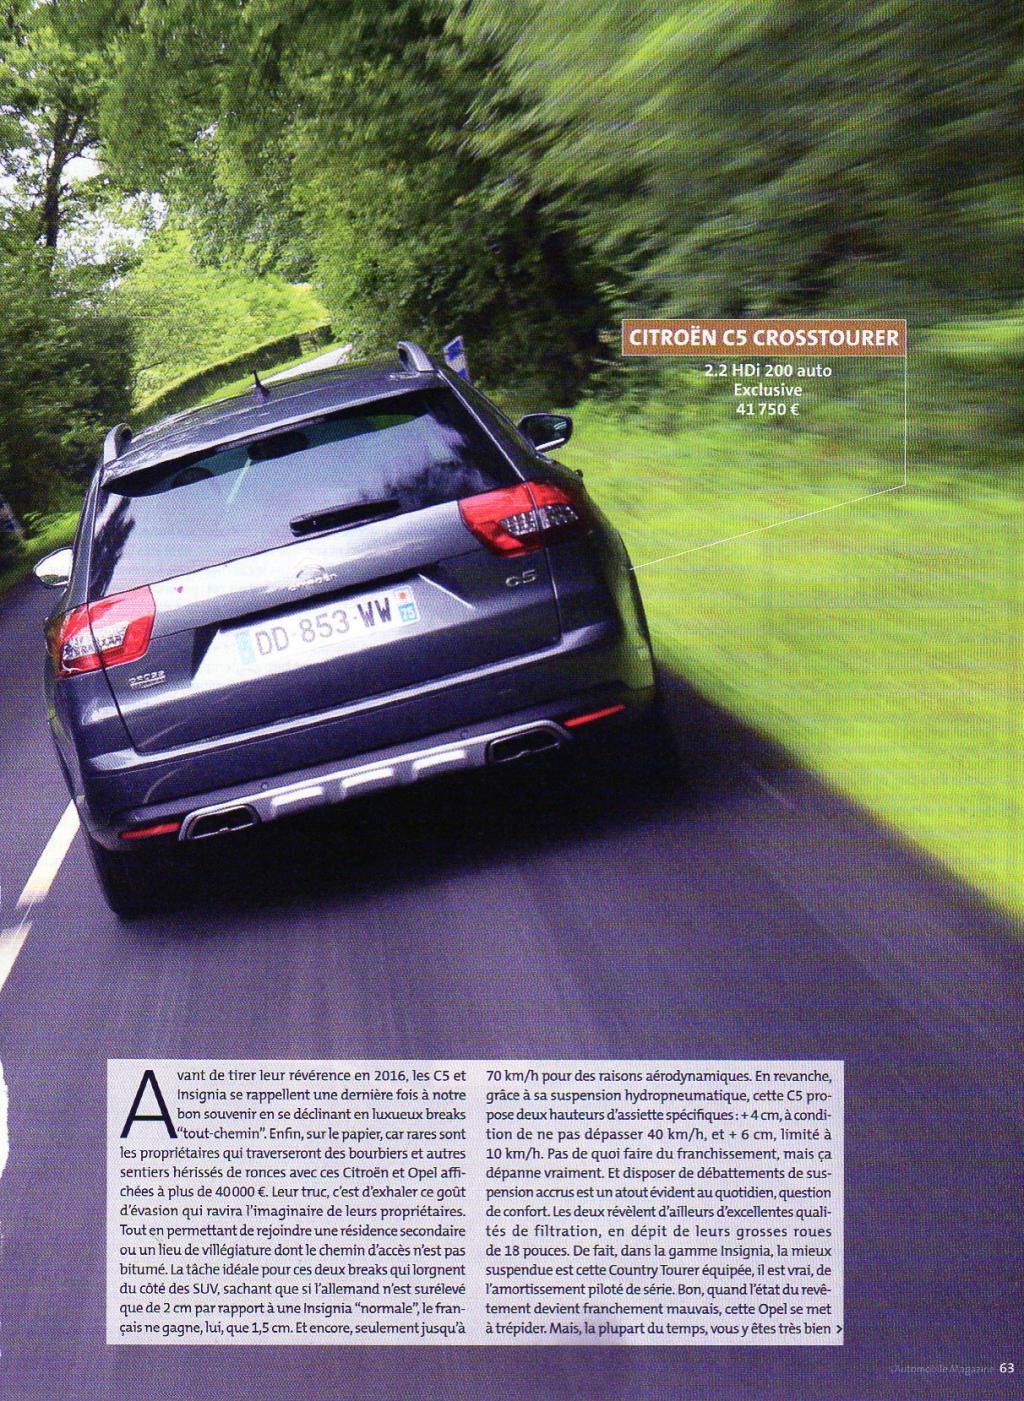 [ACTUALITE] Revue de Presse Citroën - Page 12 0---a-498-471dac3